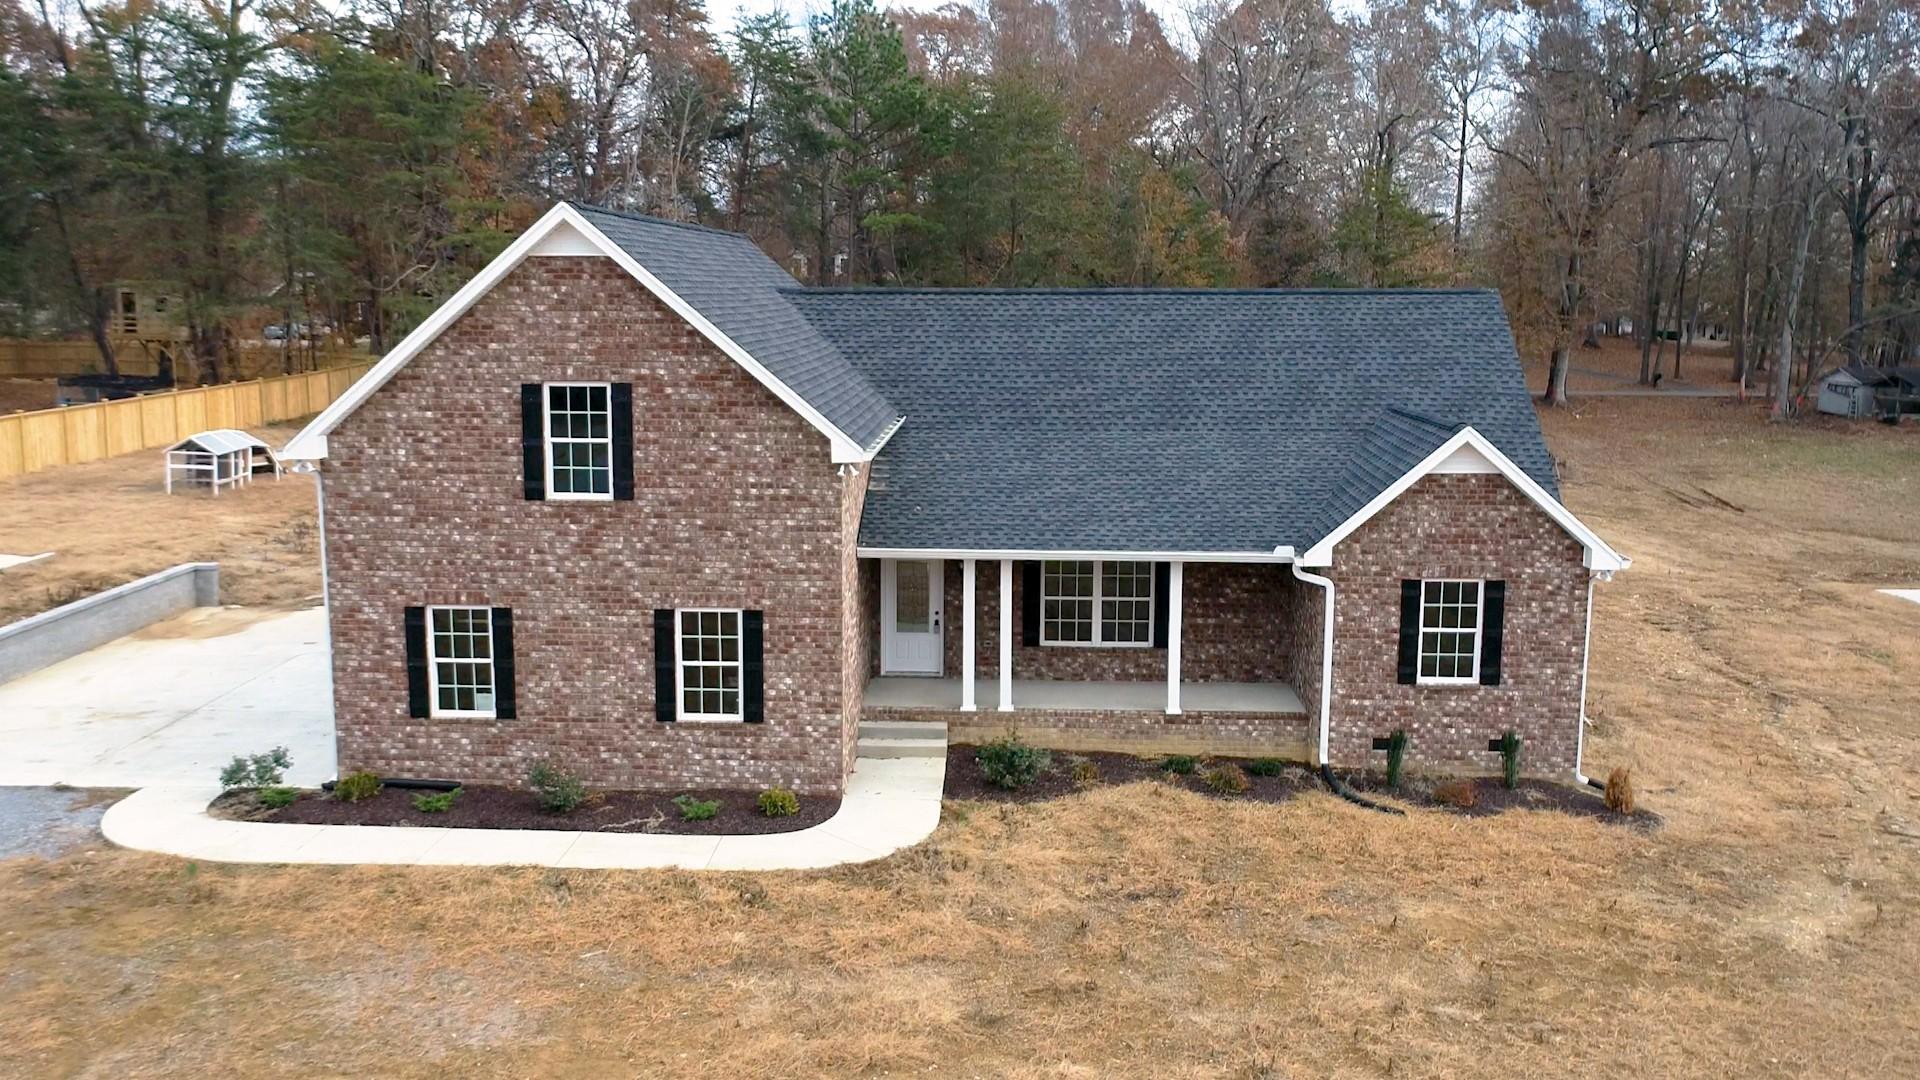 1540 Highway 49, E, Ashland City, TN 37015 - Ashland City, TN real estate listing